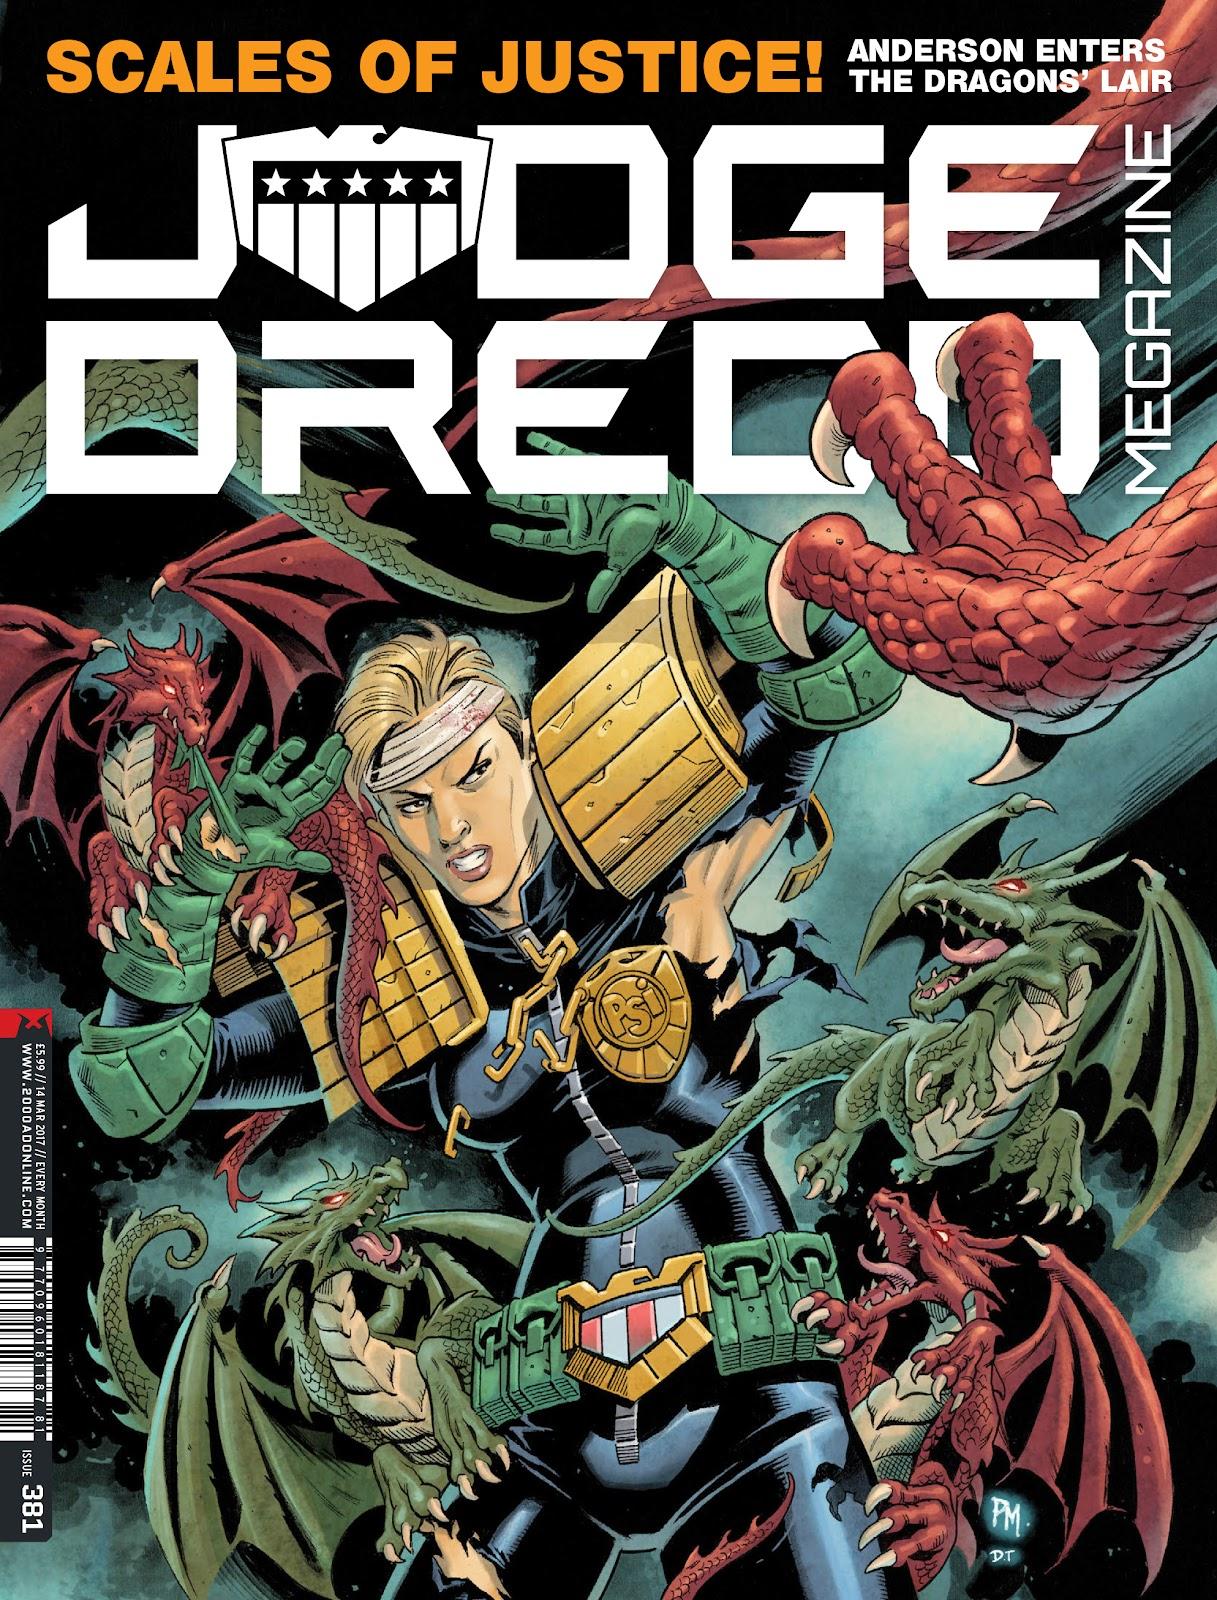 Judge Dredd Megazine (Vol. 5) issue 381 - Page 1